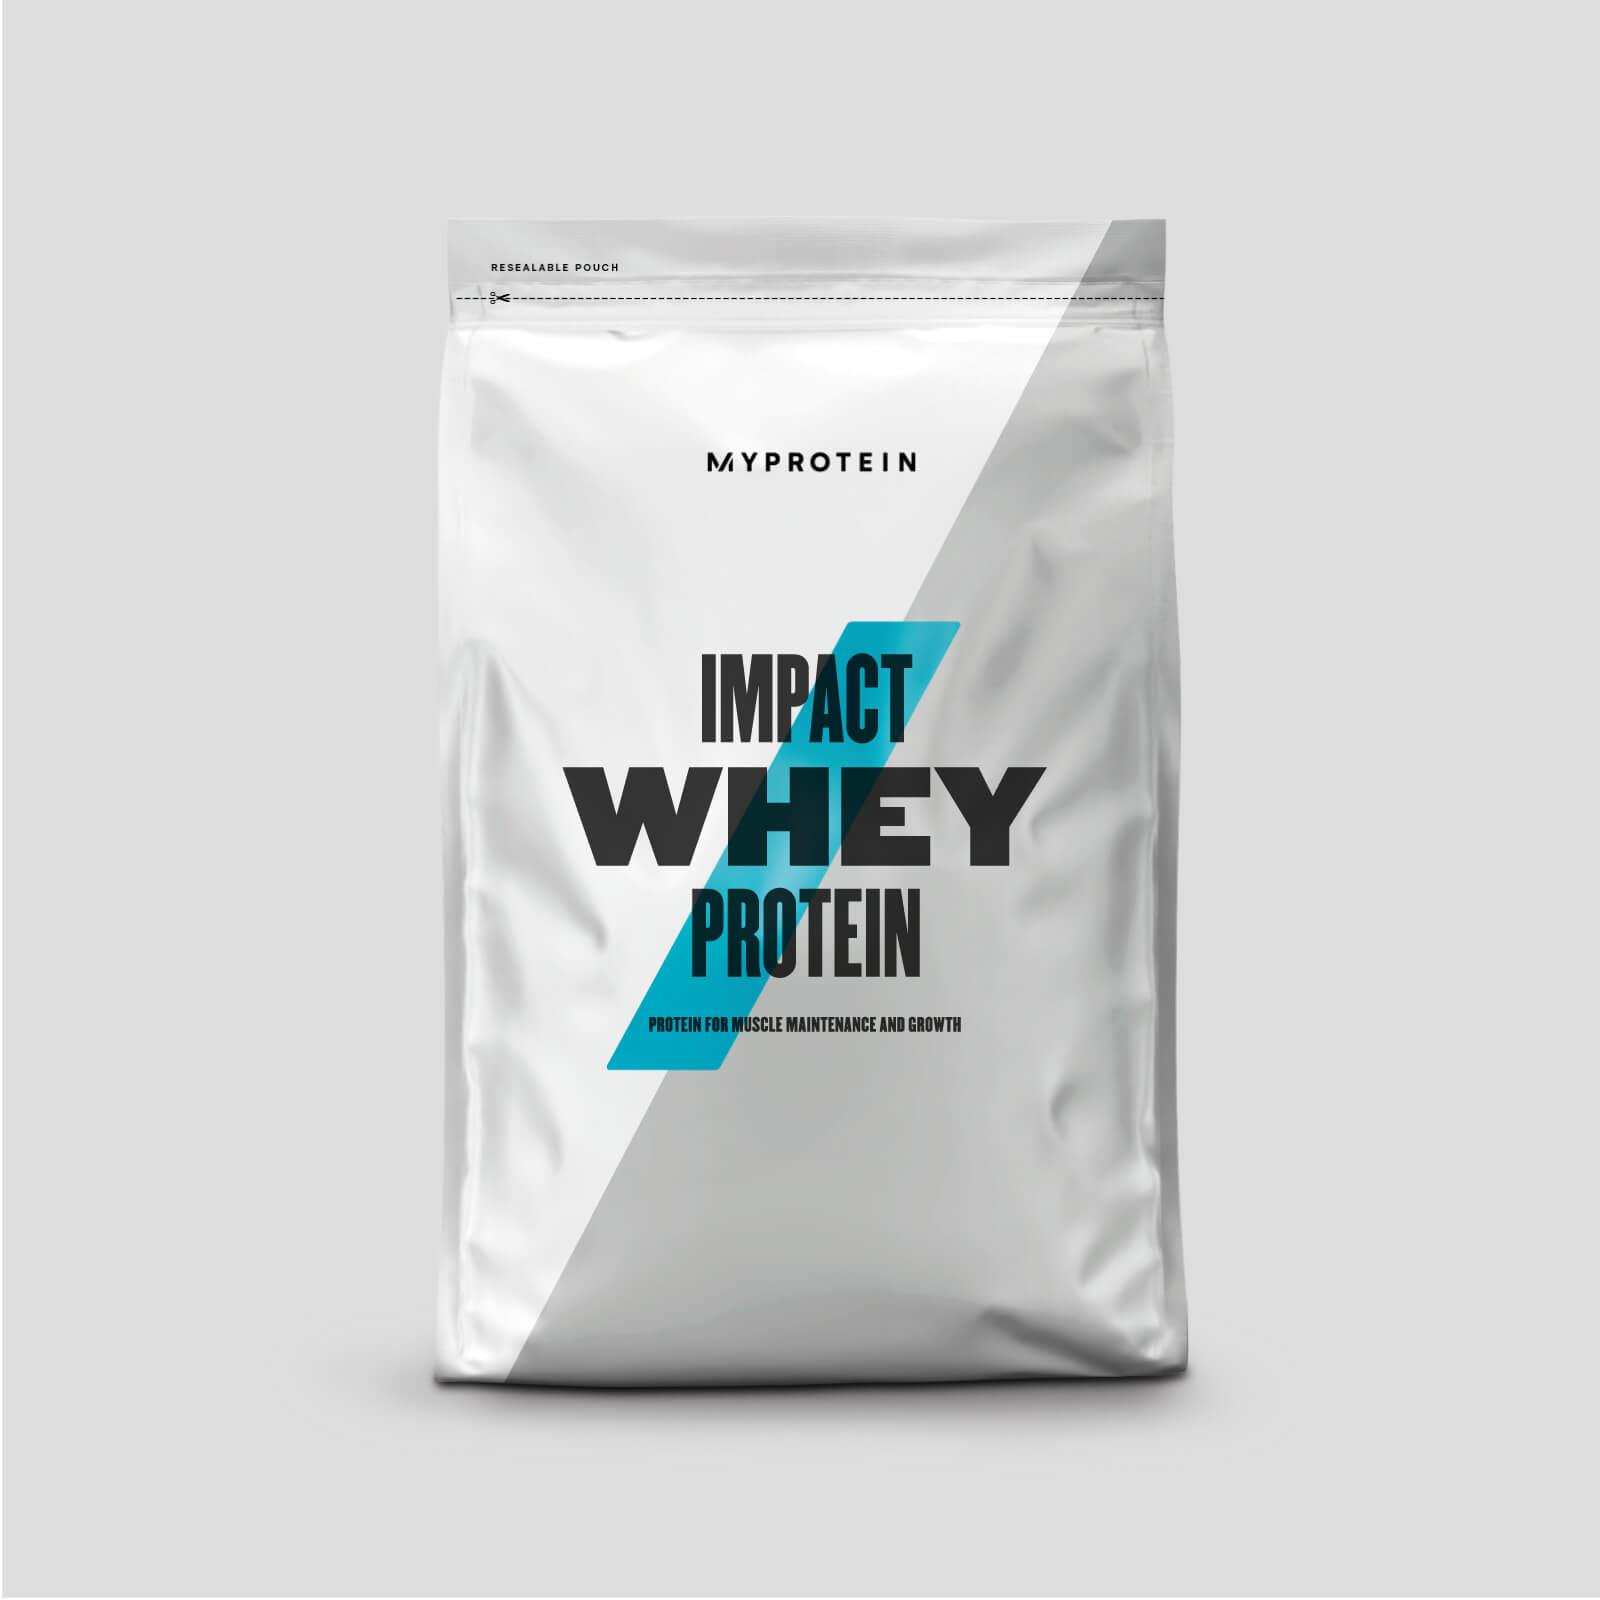 Myprotein Impact Whey Protein - 2.5kg - Stevia - Chocolat à la menthe